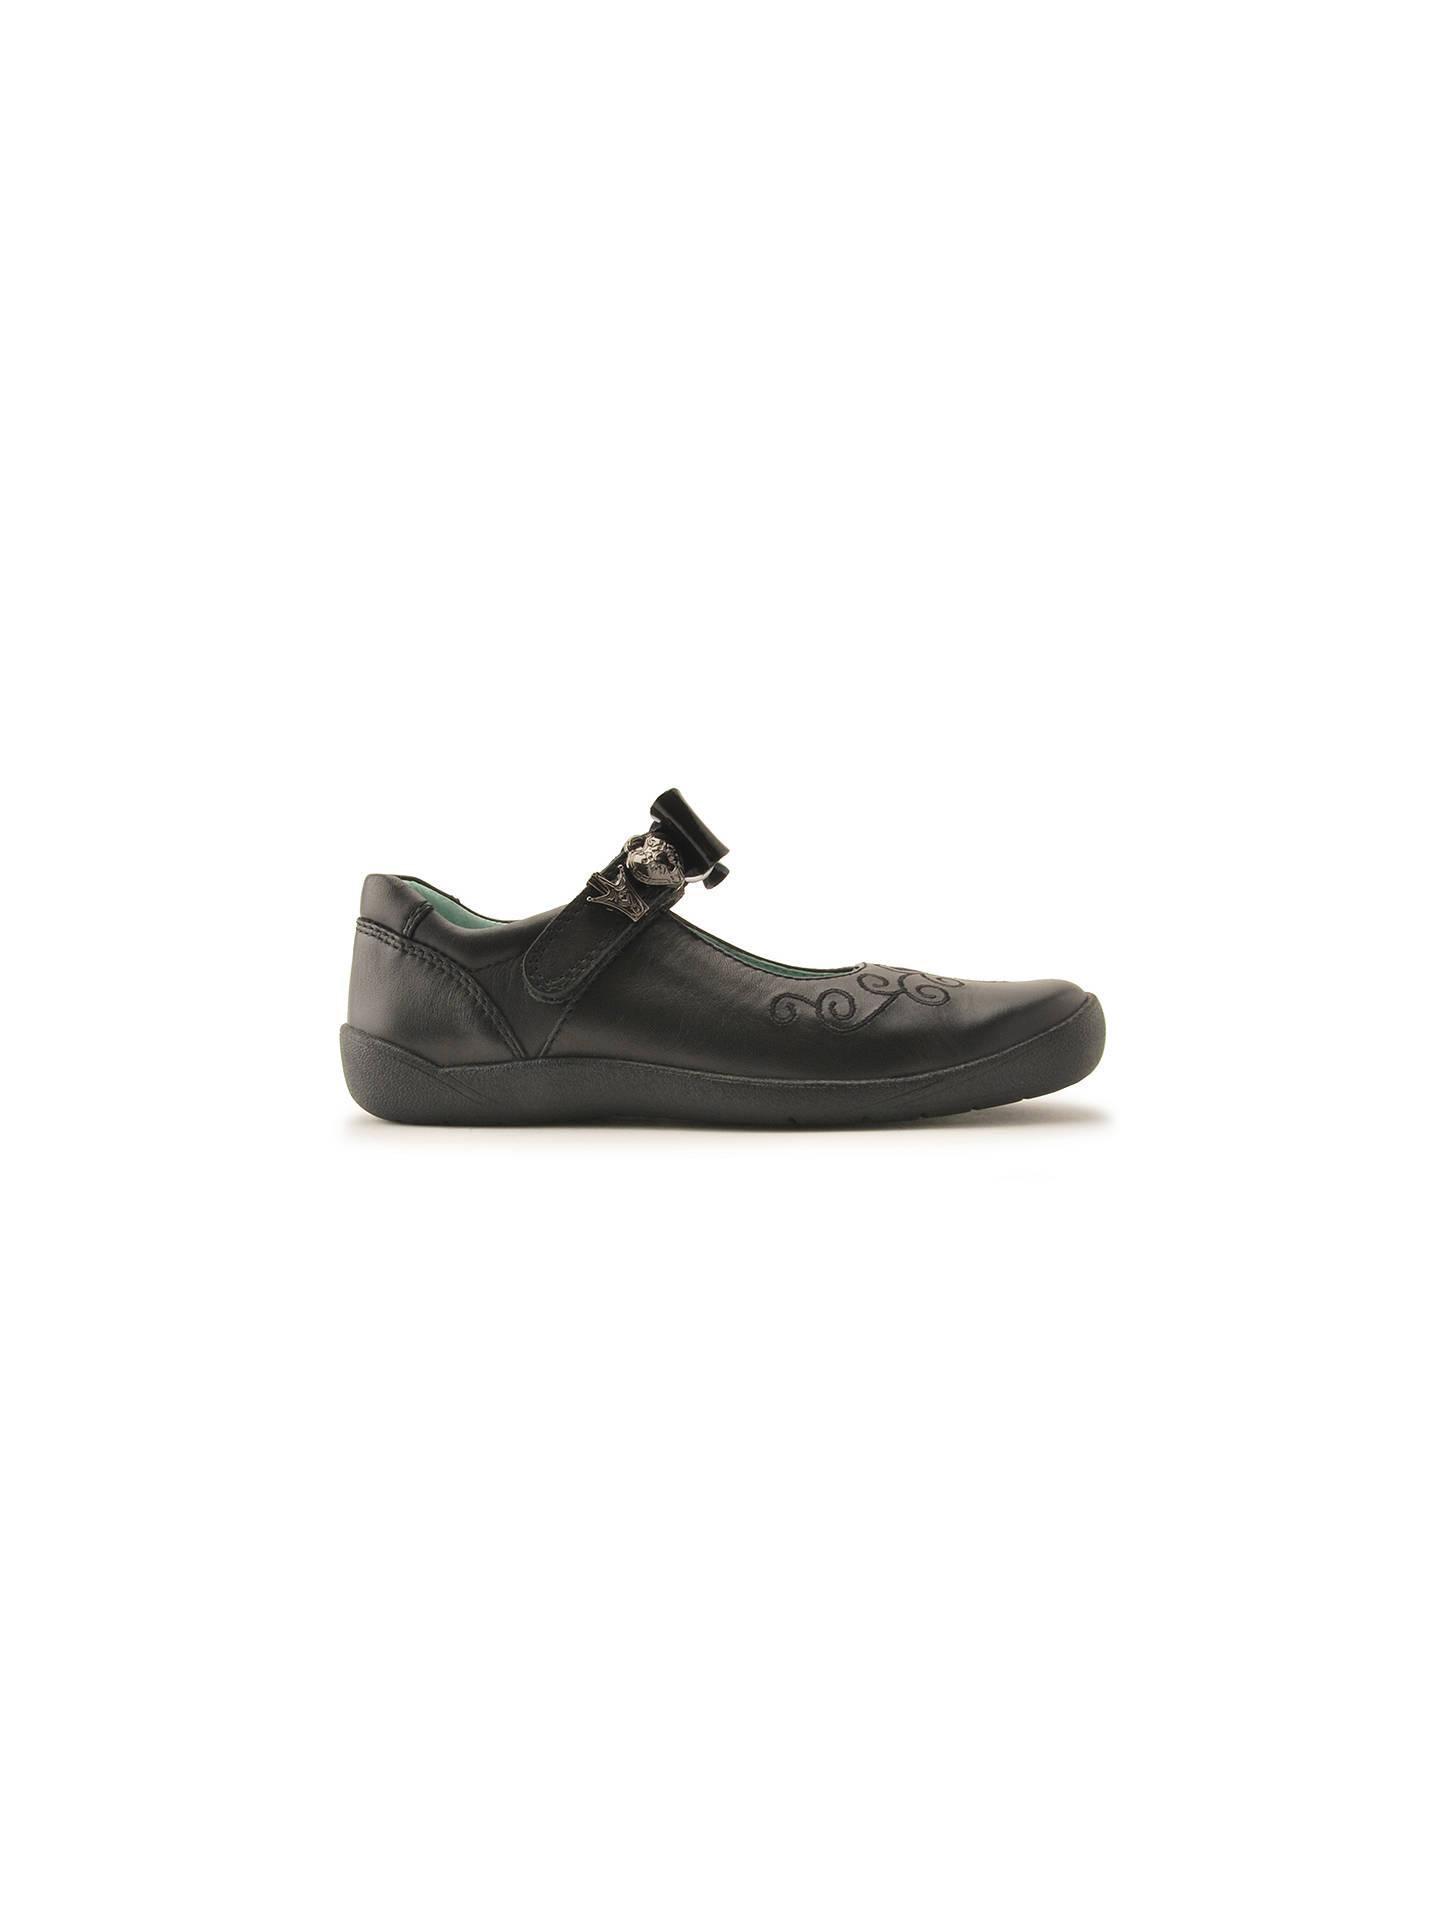 5b04a5178ef9f Start-rite Children's Elza Mary Jane School Shoes, Black at John ...